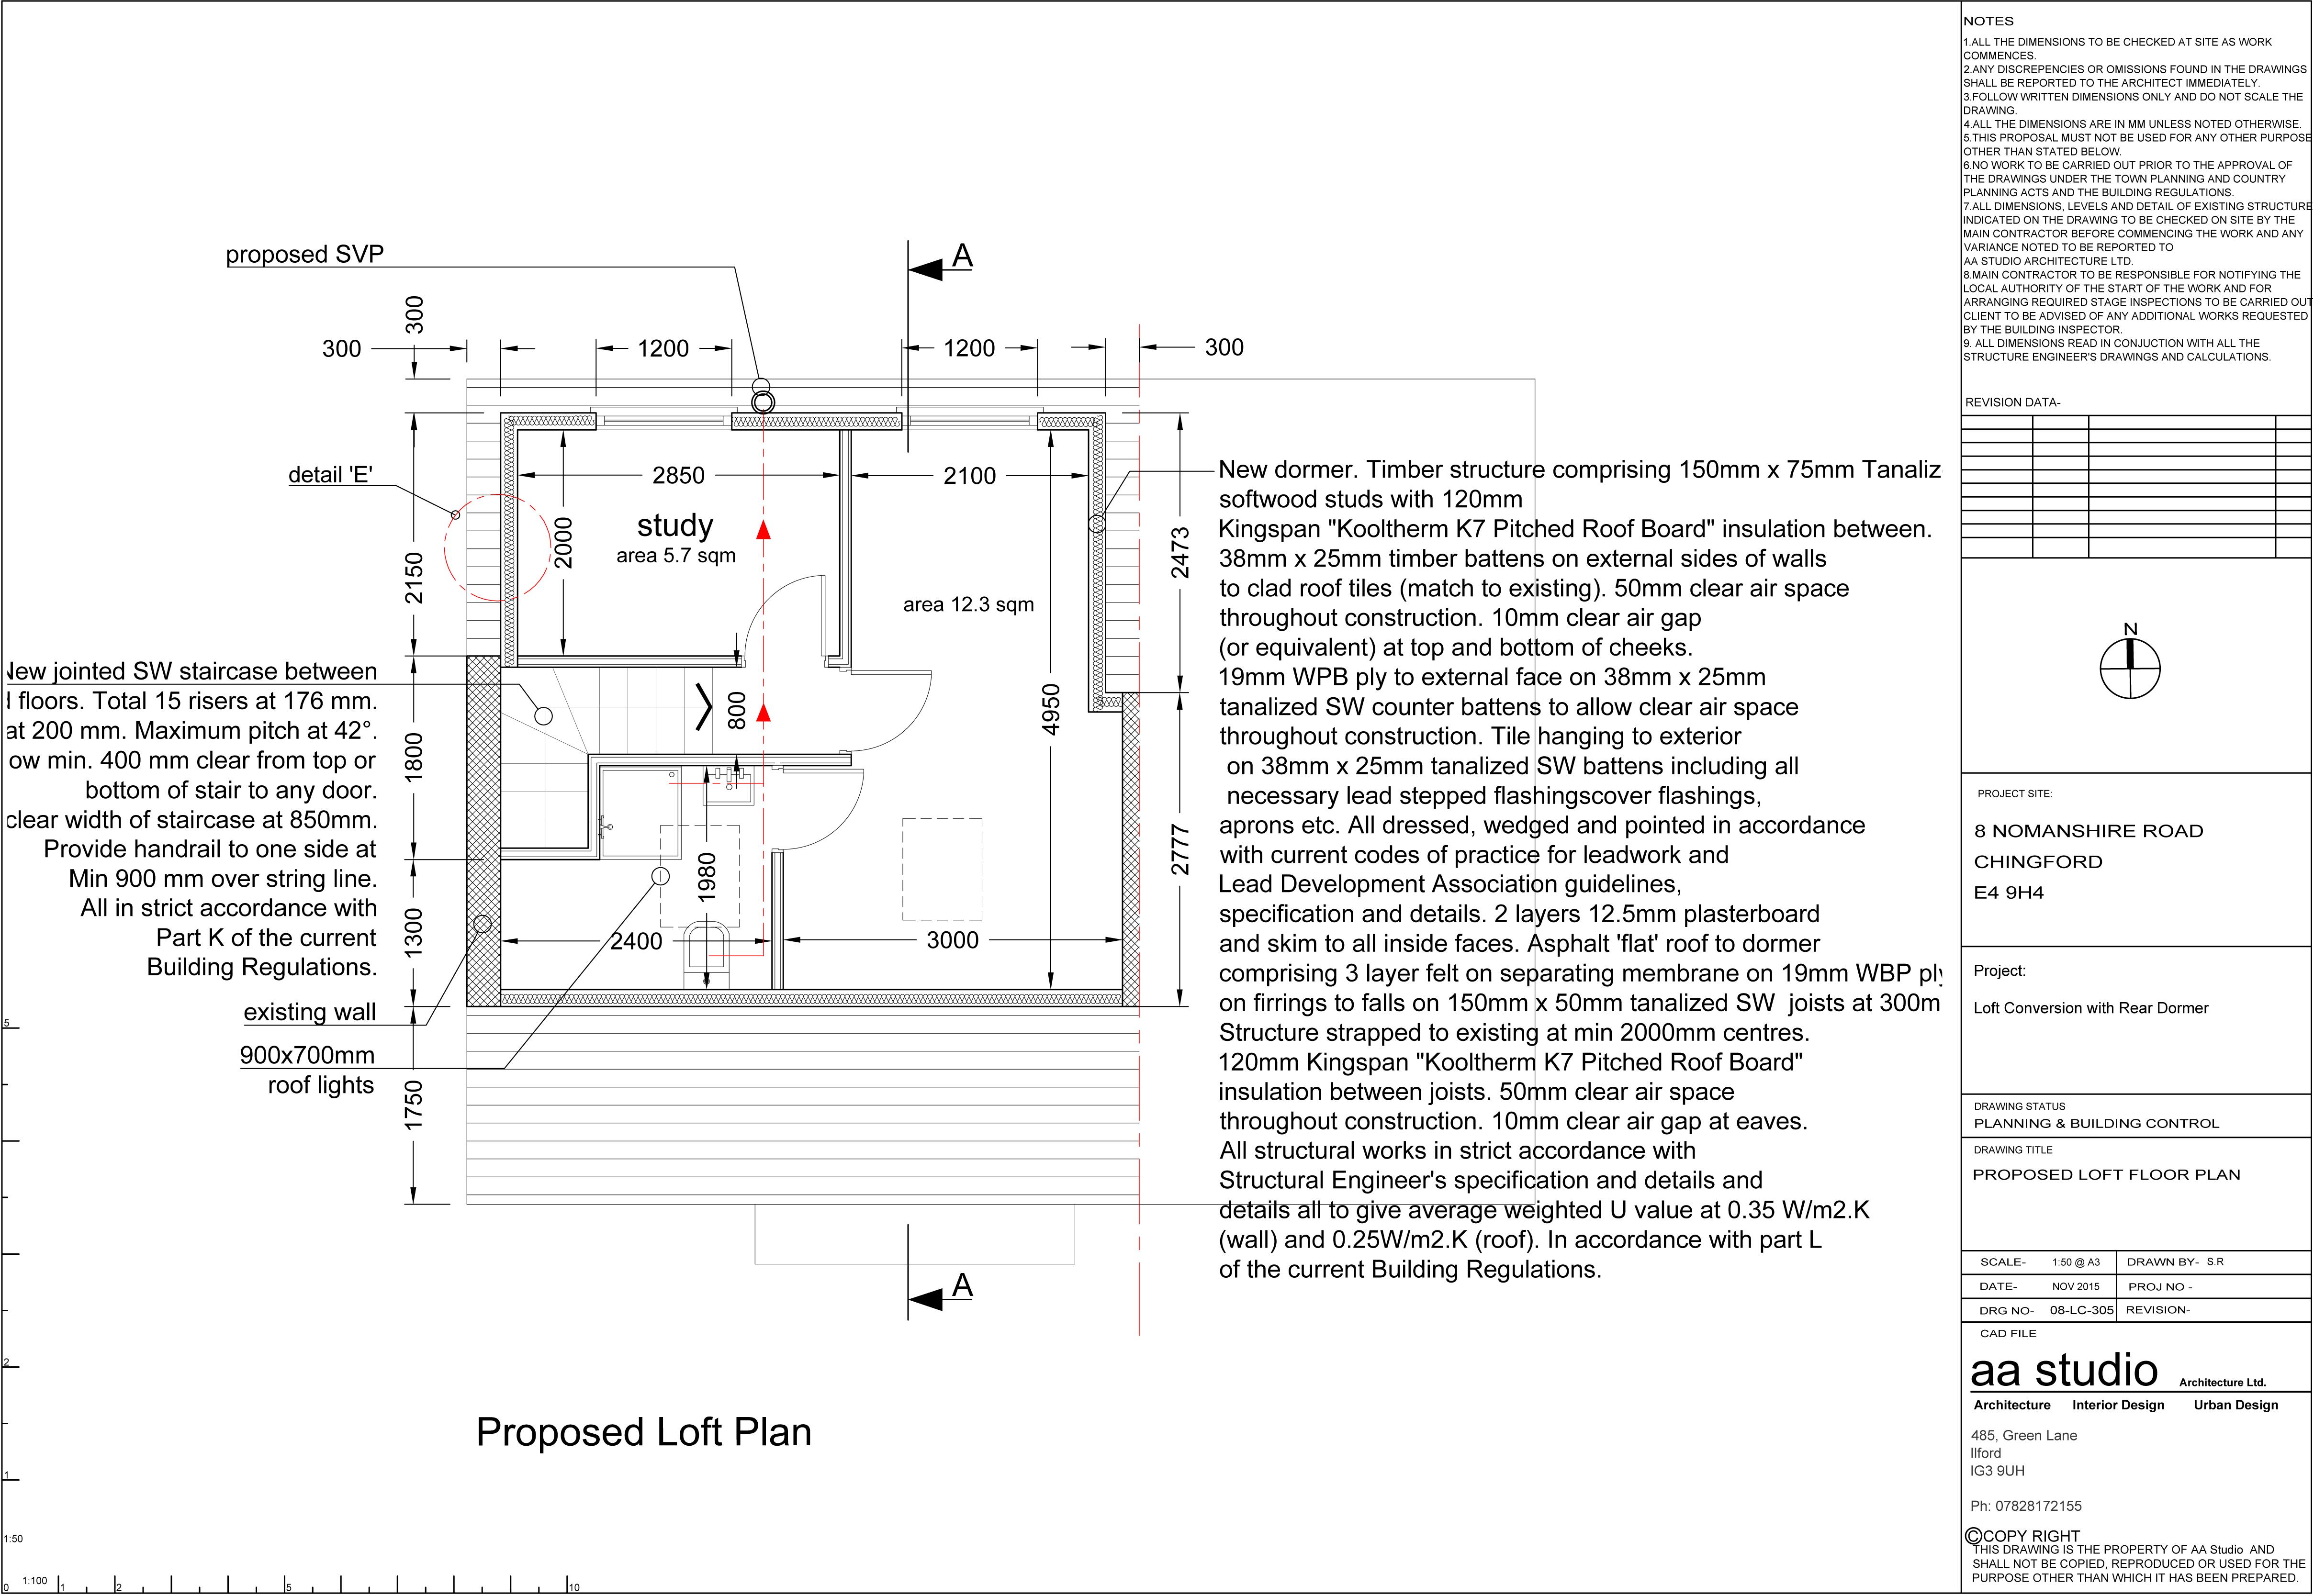 Loft Conversion Chingford_